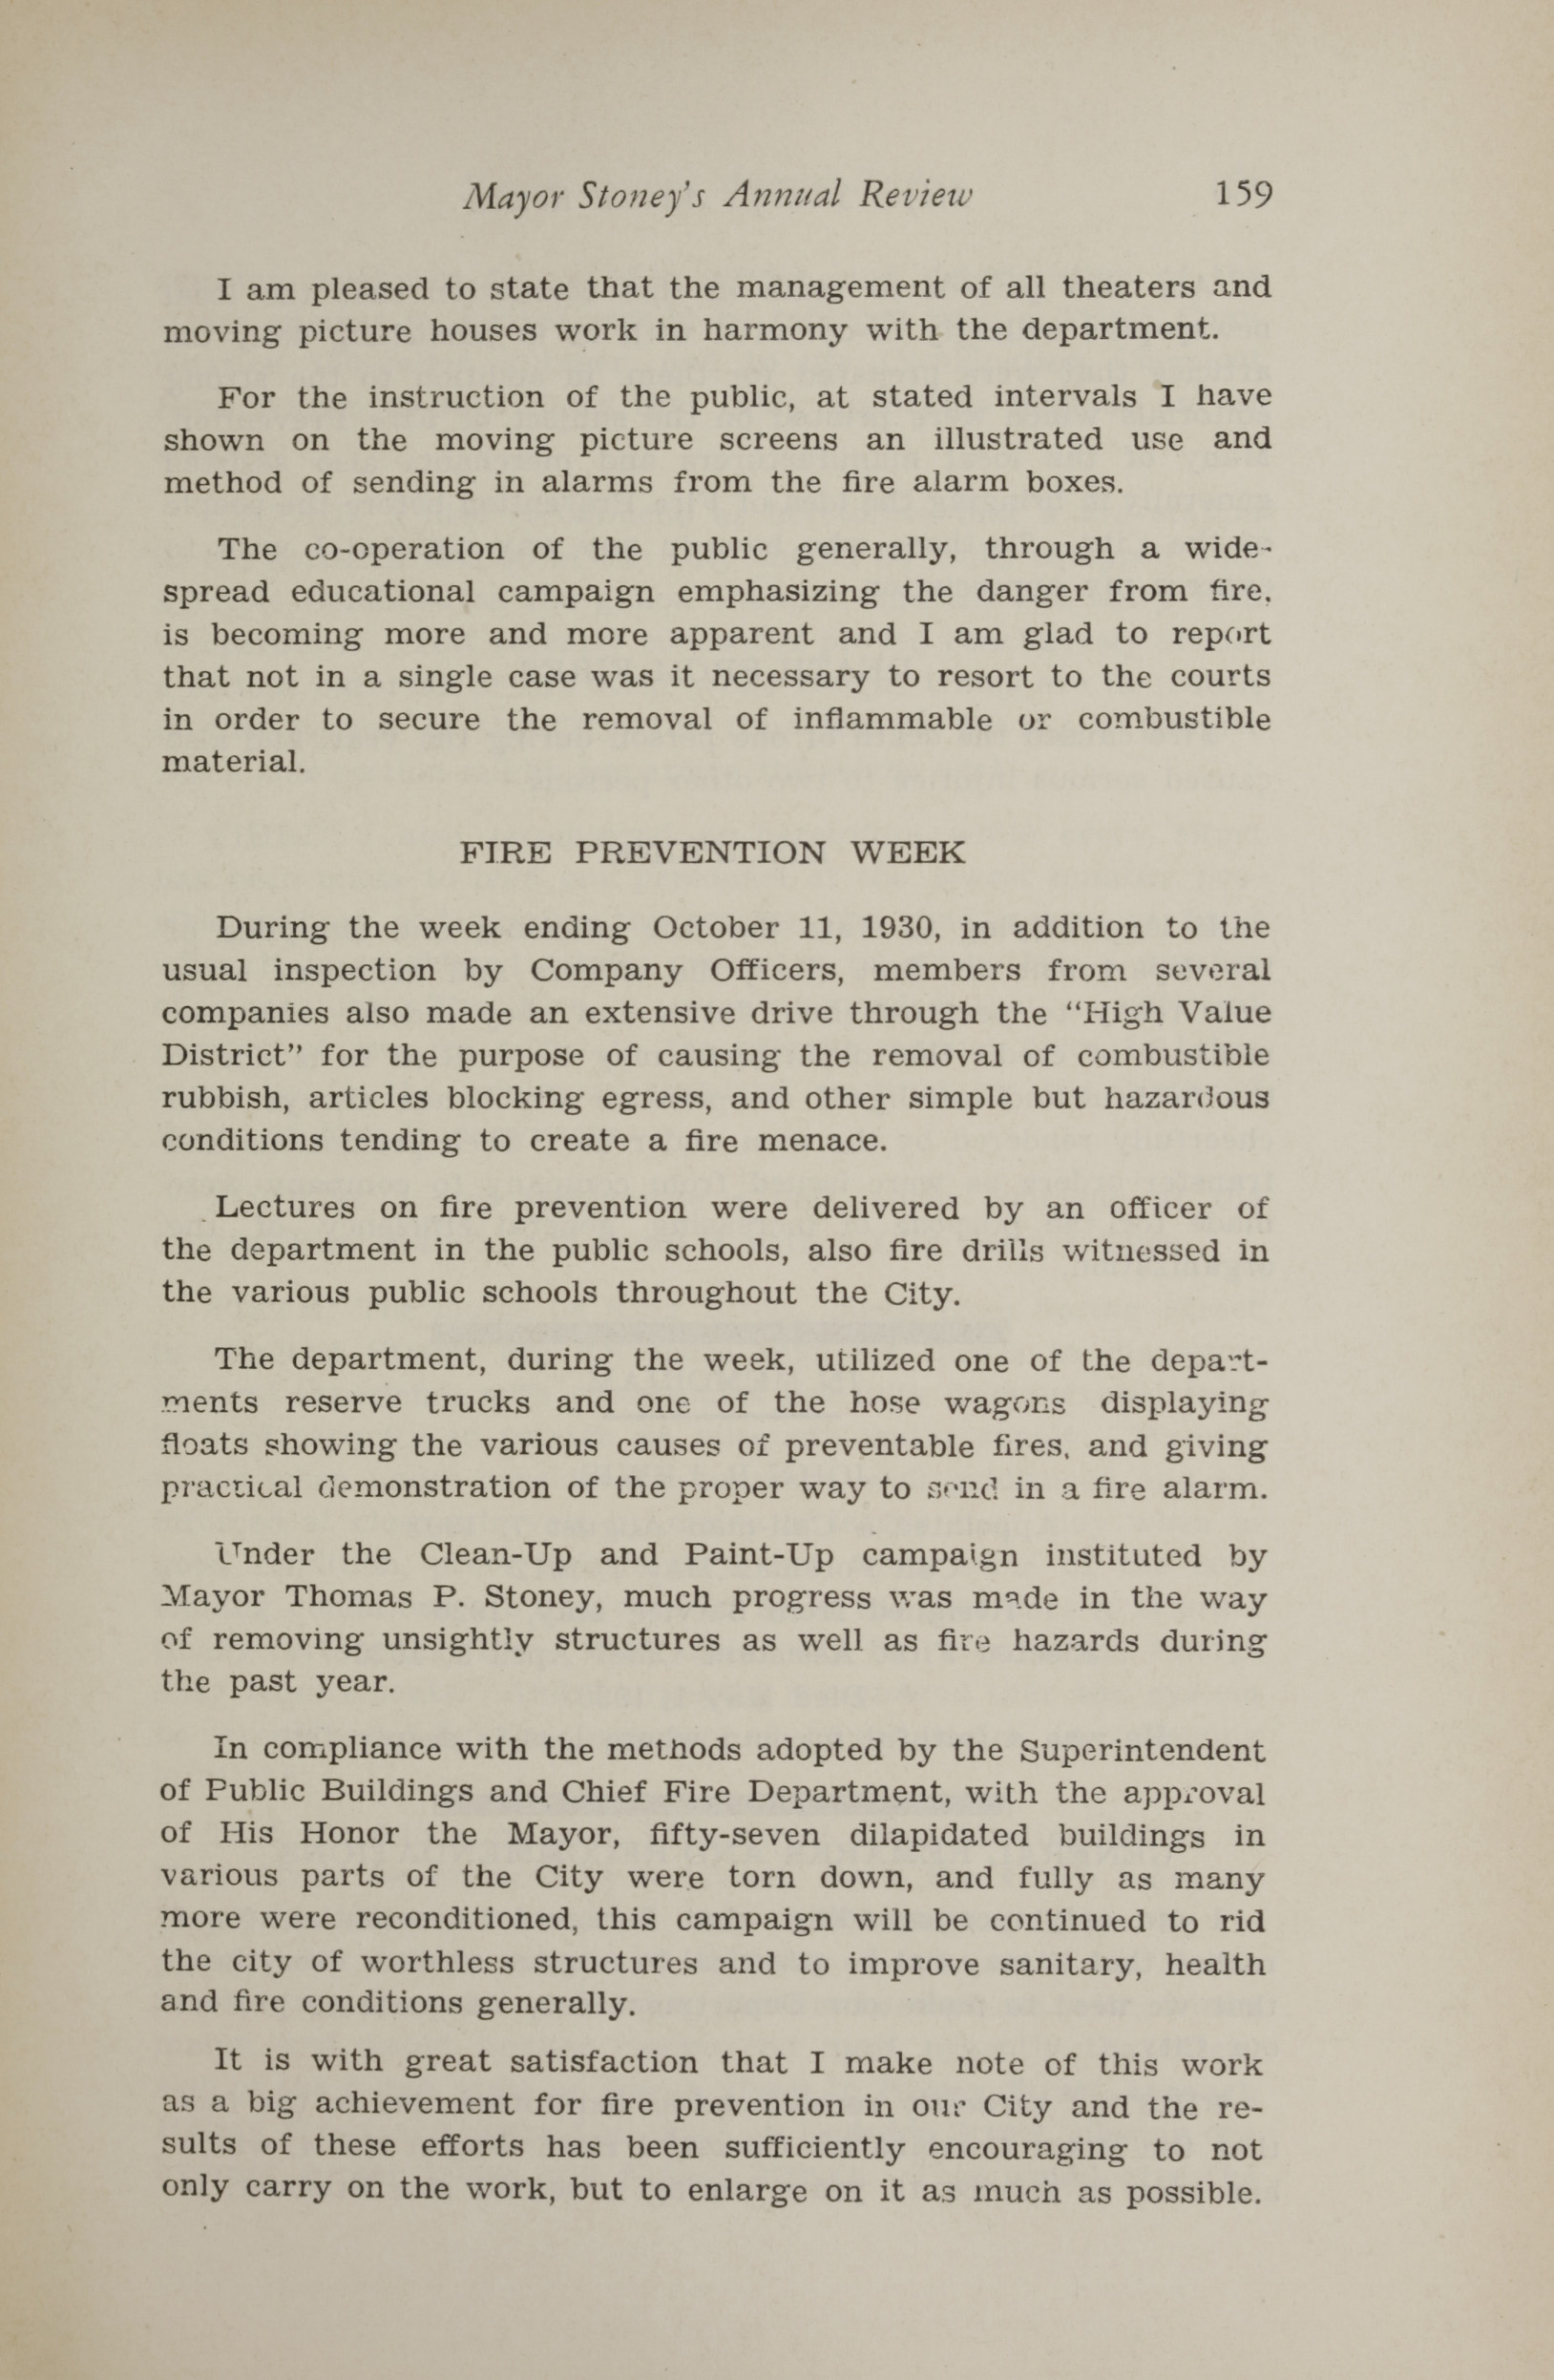 Charleston Yearbook, 1930, page 159